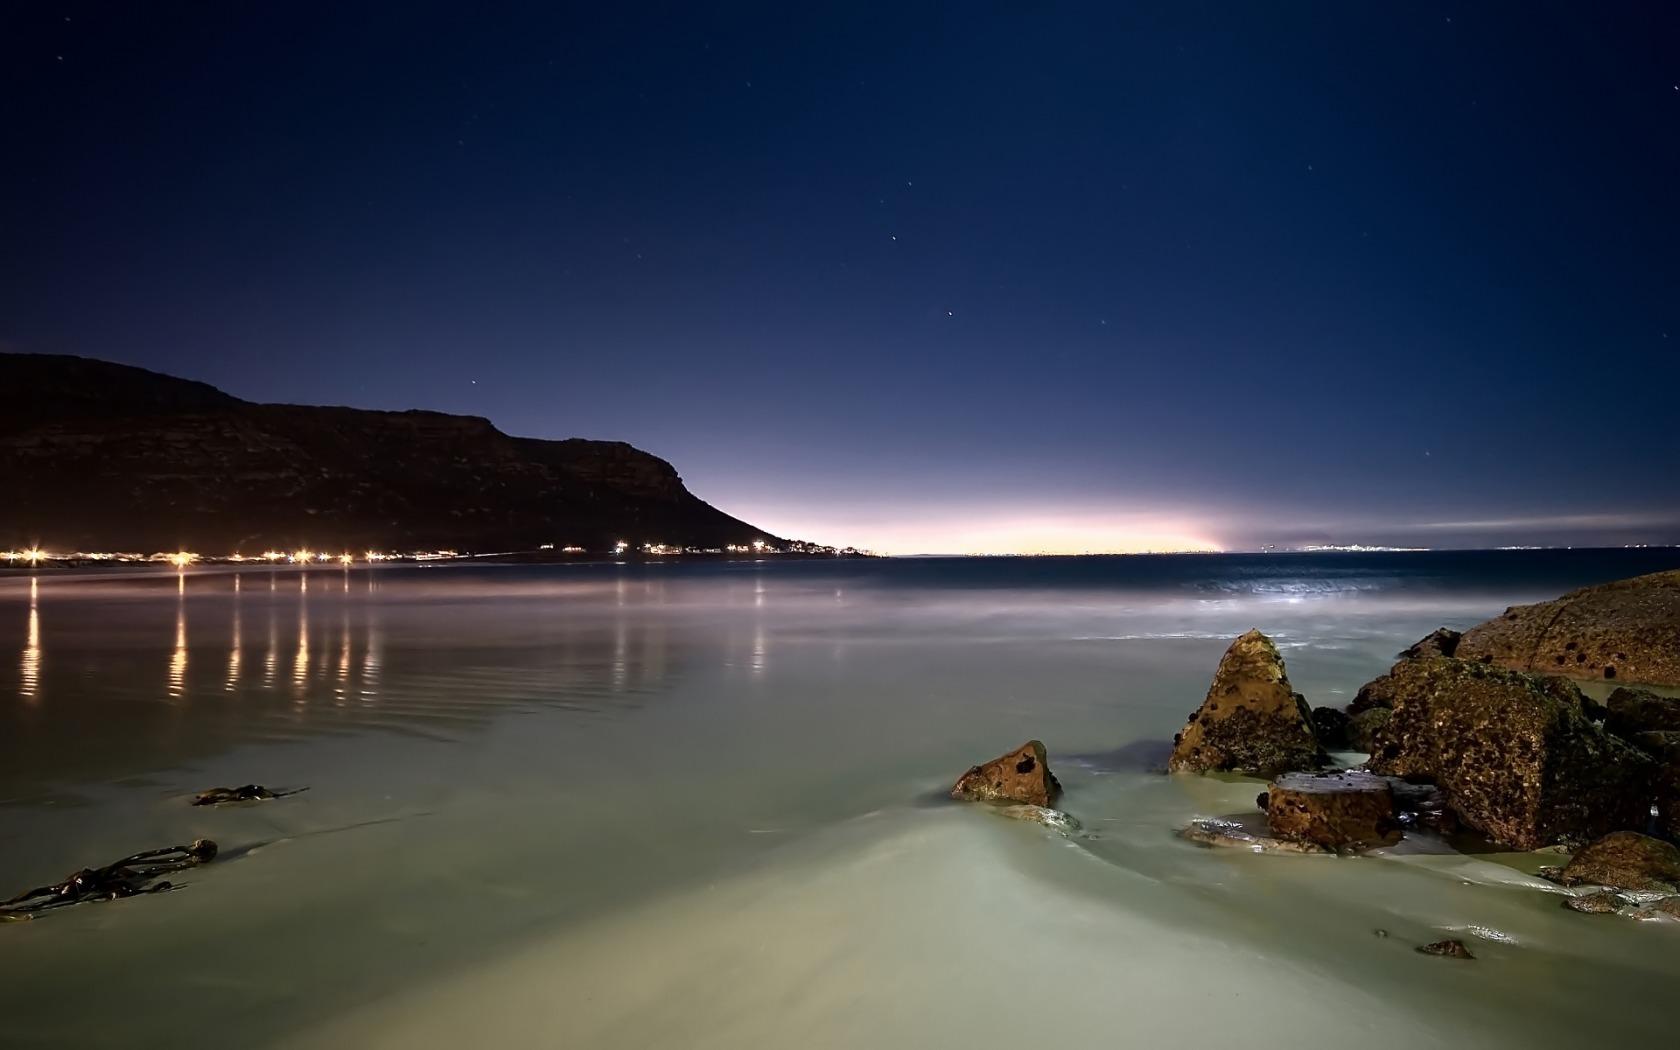 night_at_beach_1680_x_1050_widescreen.jpg